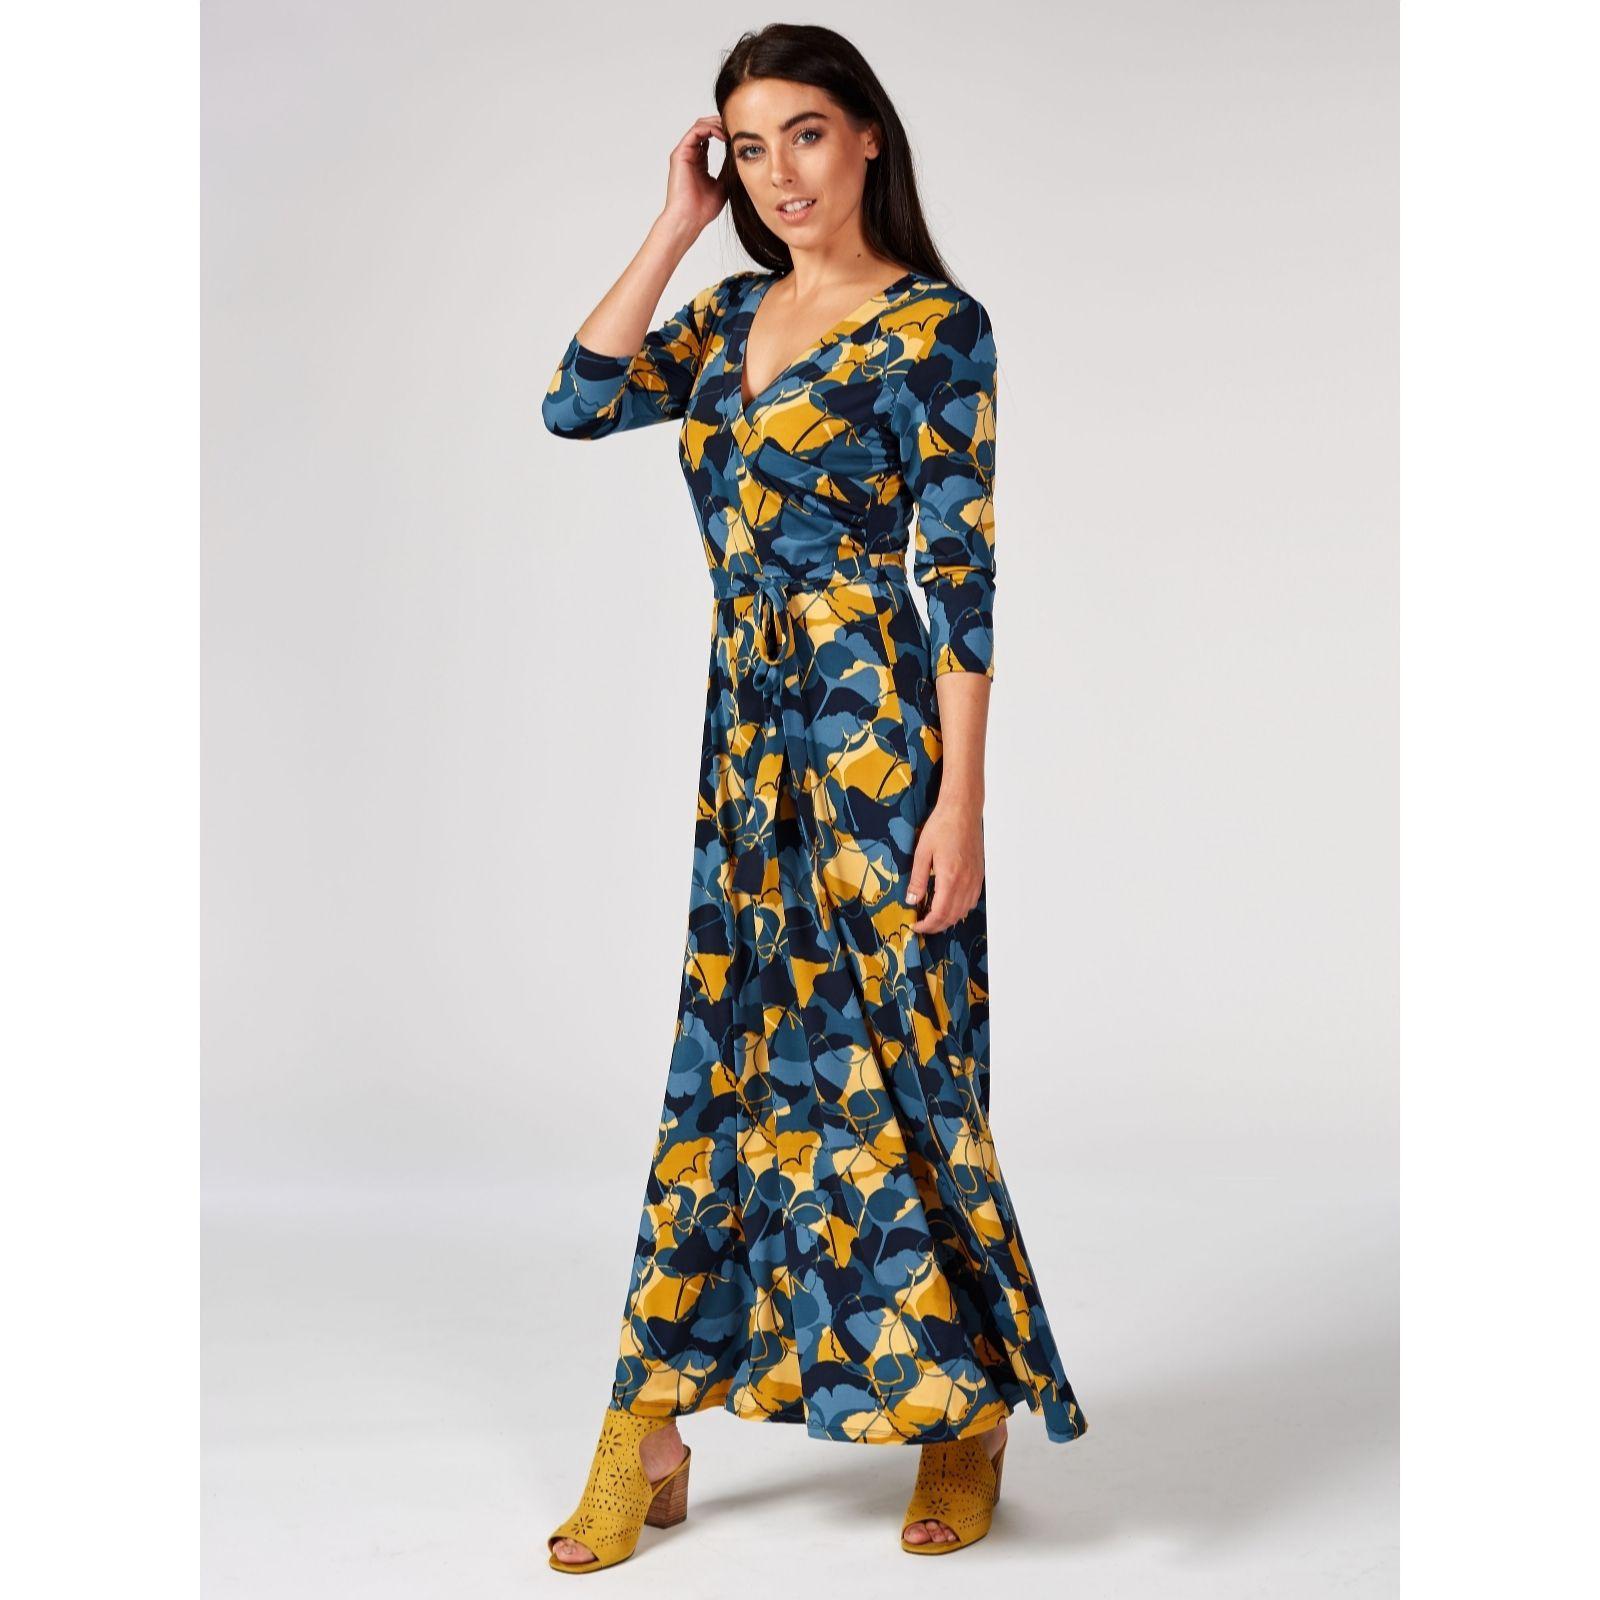 e7f5929073 Du Jour Printed Faux Wrap Maxi Dress Petite - QVC UK